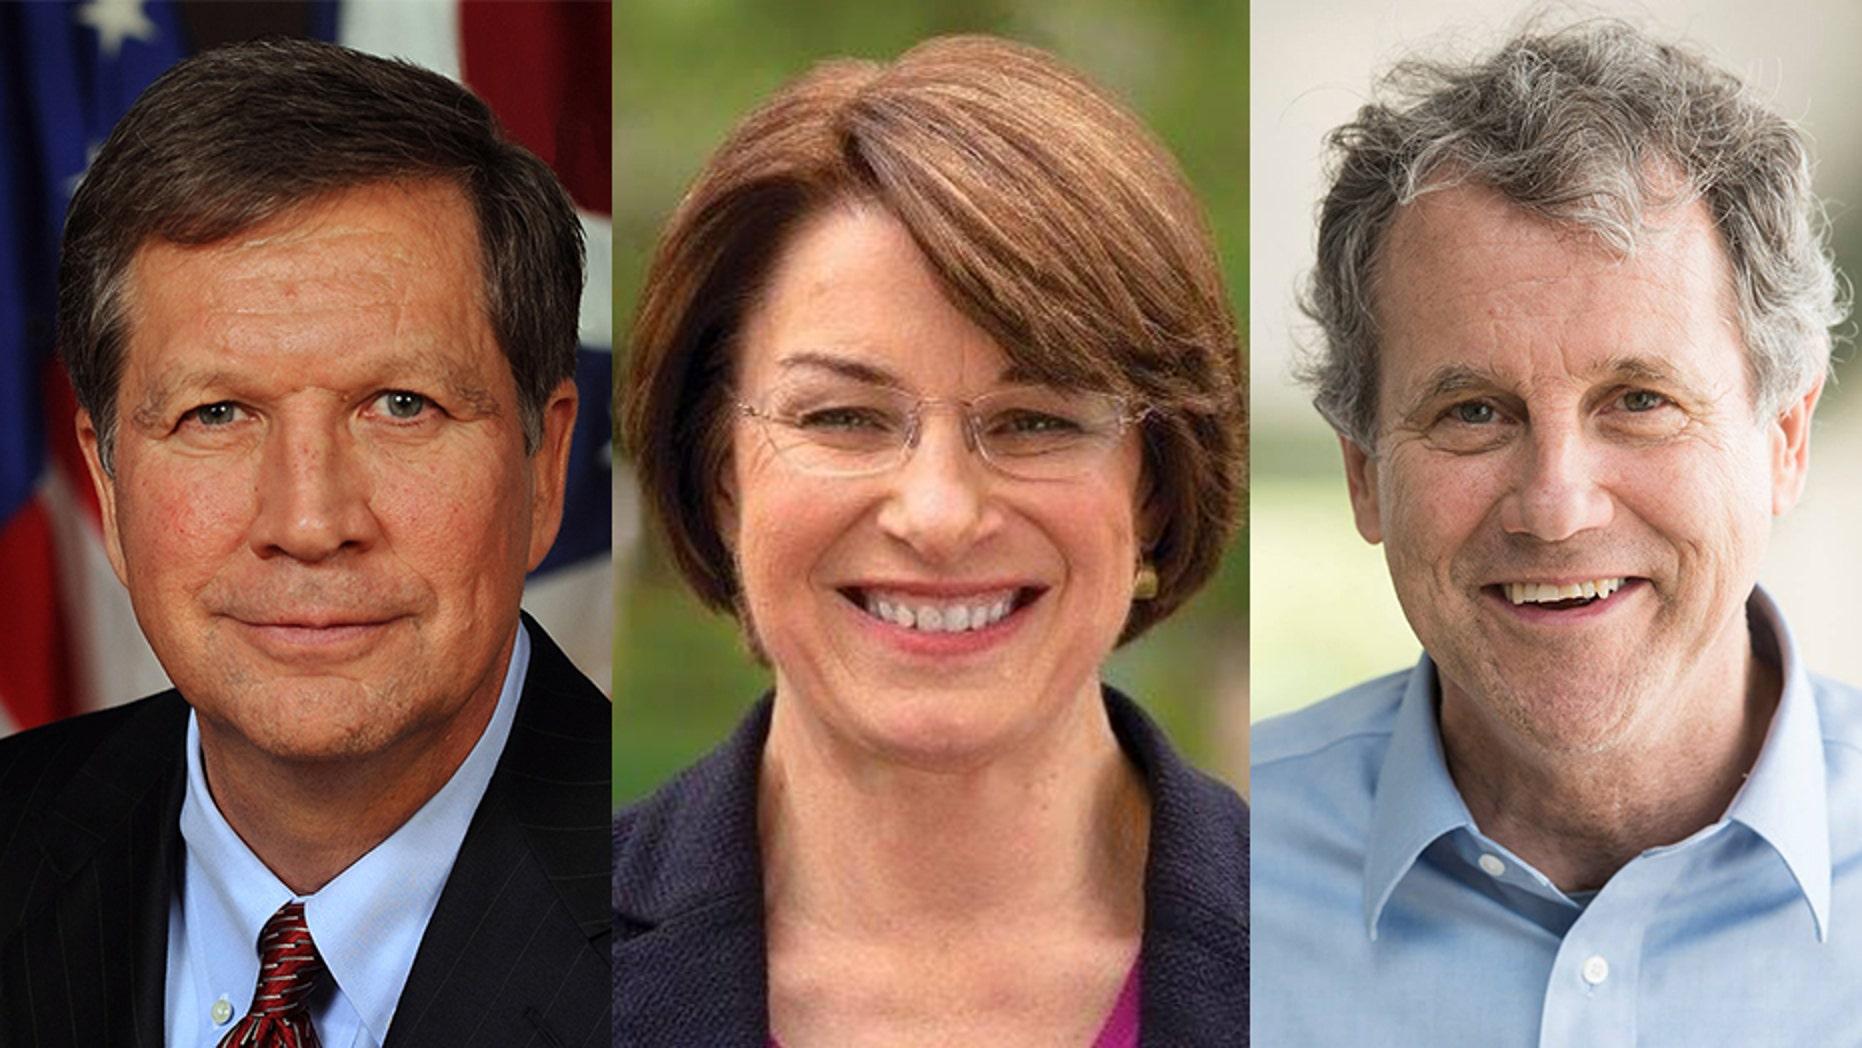 Ohio Gov. John Kasich, Minnesota Sen. Amy Klobuchar and Ohio Sen. Sherrod Brown.